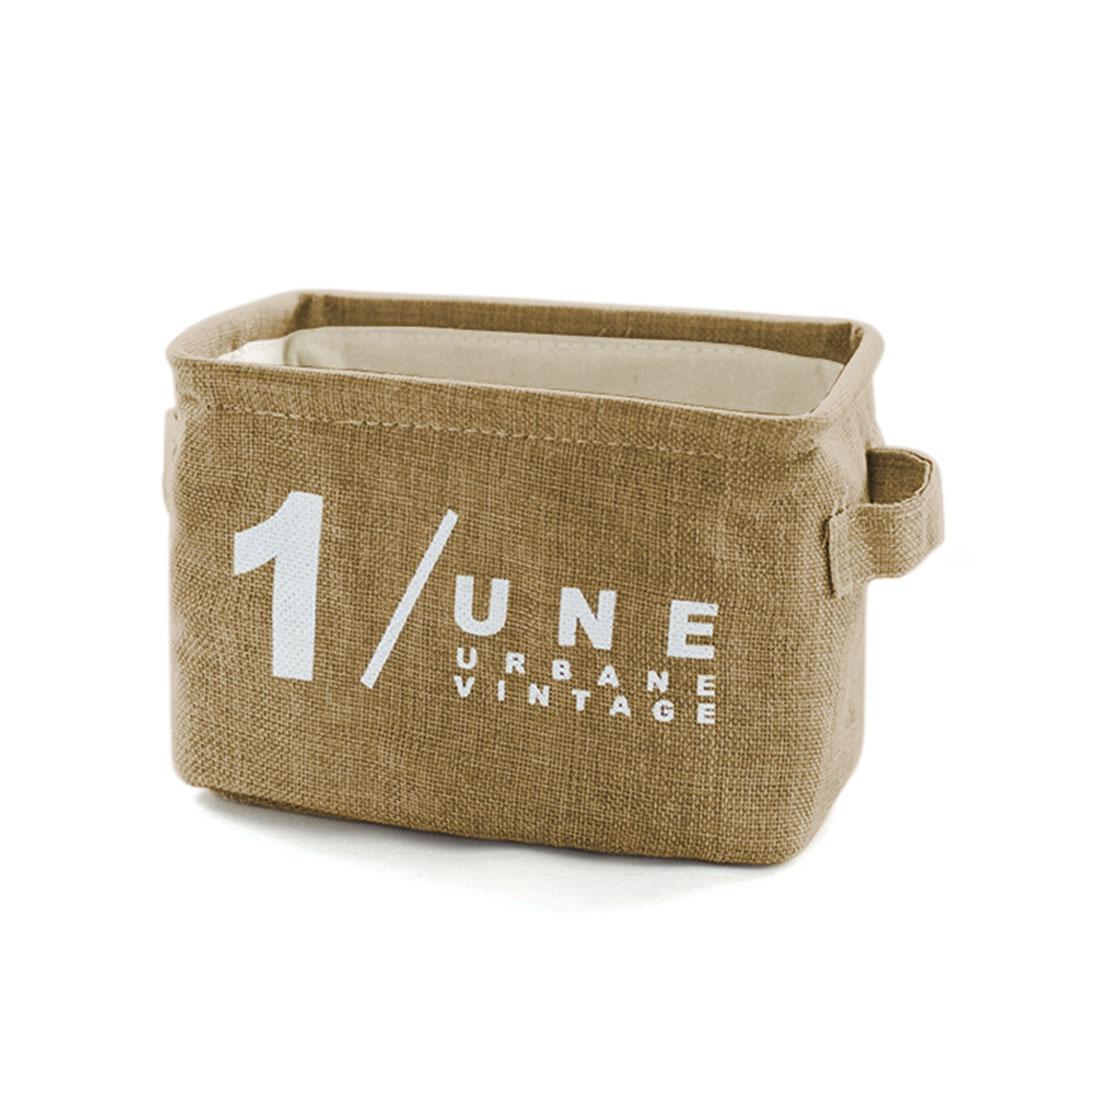 Household Number Pattern Foldable Linen Supplies Storage Bag Basket Light Brow